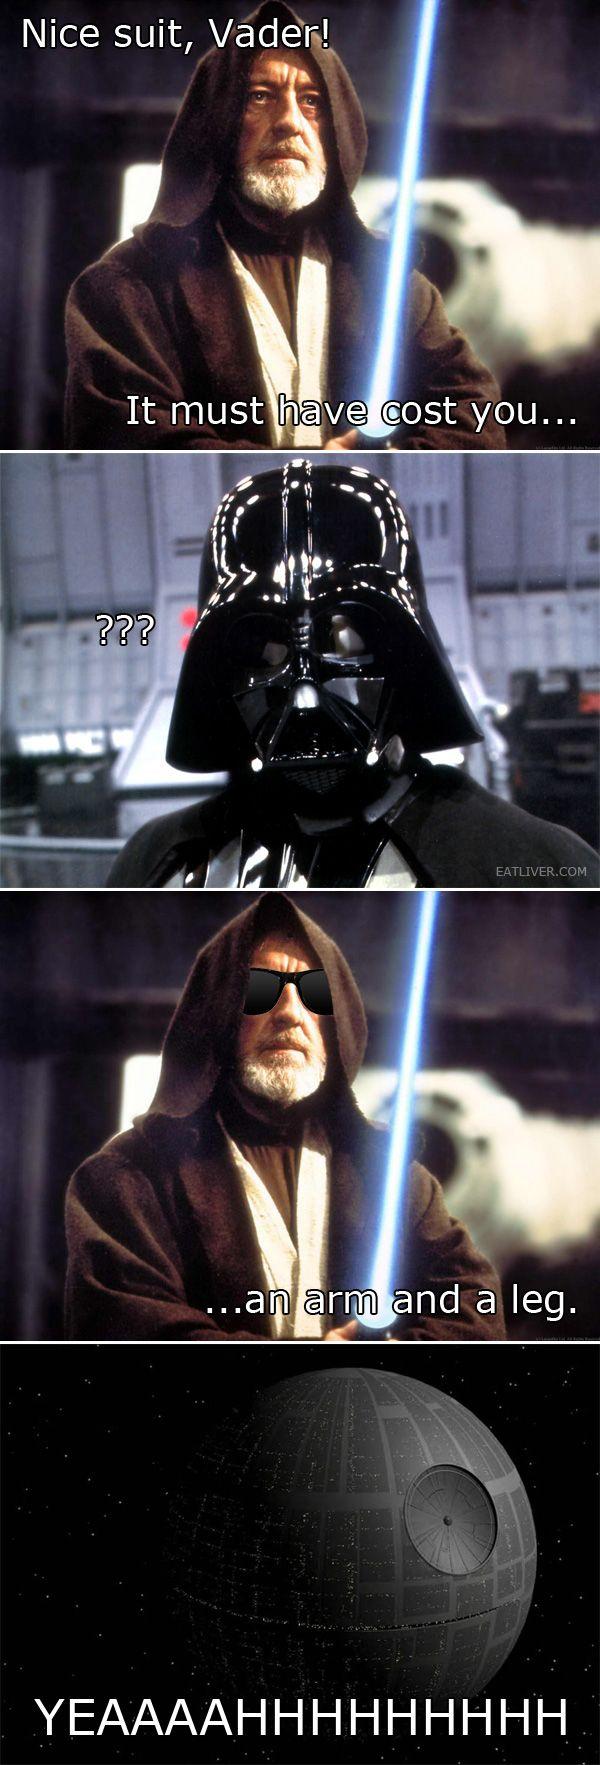 Nice suit, Vader! LOL